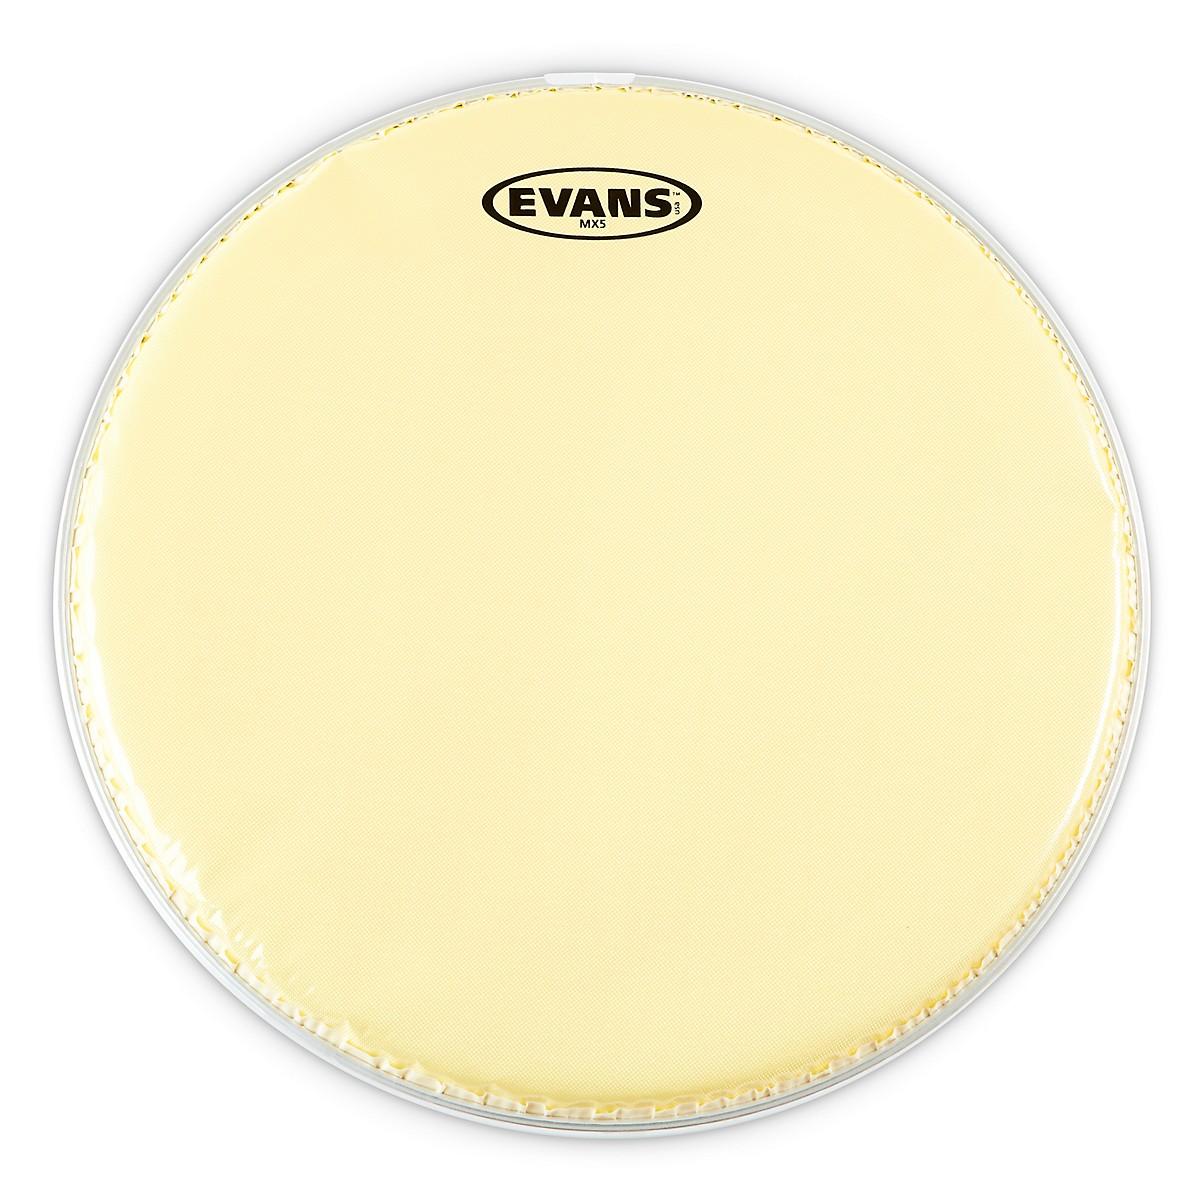 Evans MX5 Snare Side Head